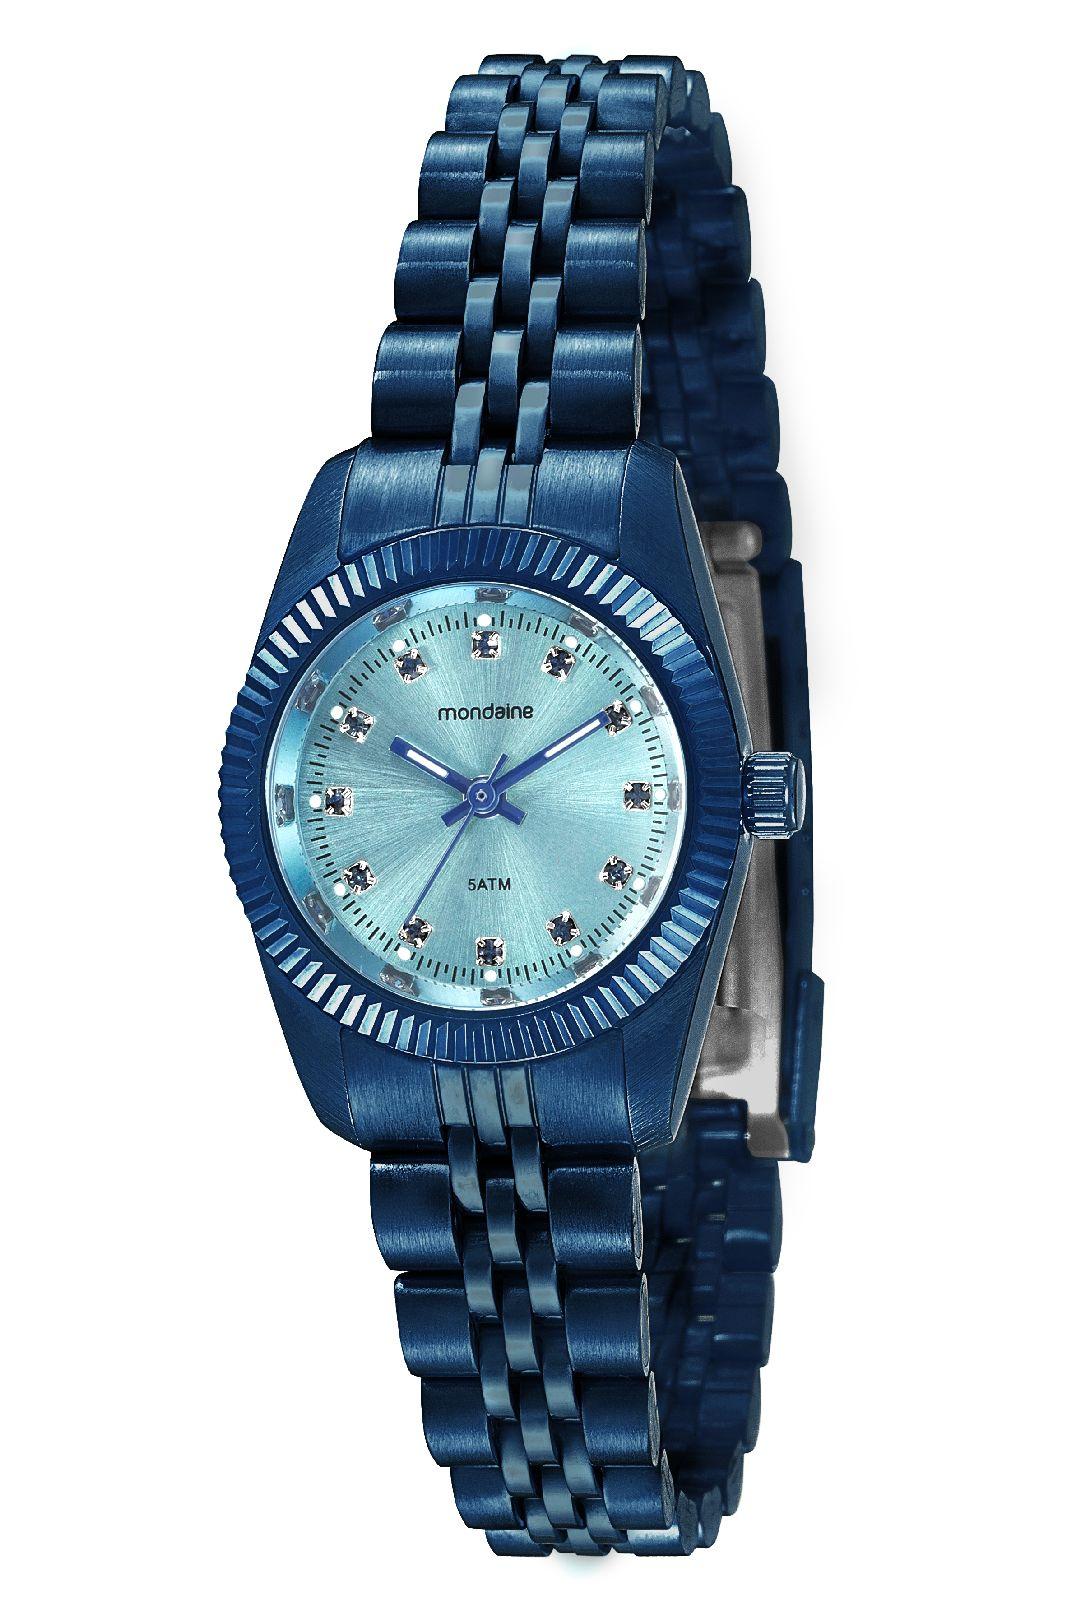 Relógio Feminino Mondaine Pulseira de Aço Inoxidável Azul Fundo Azul 99169LPMVES1